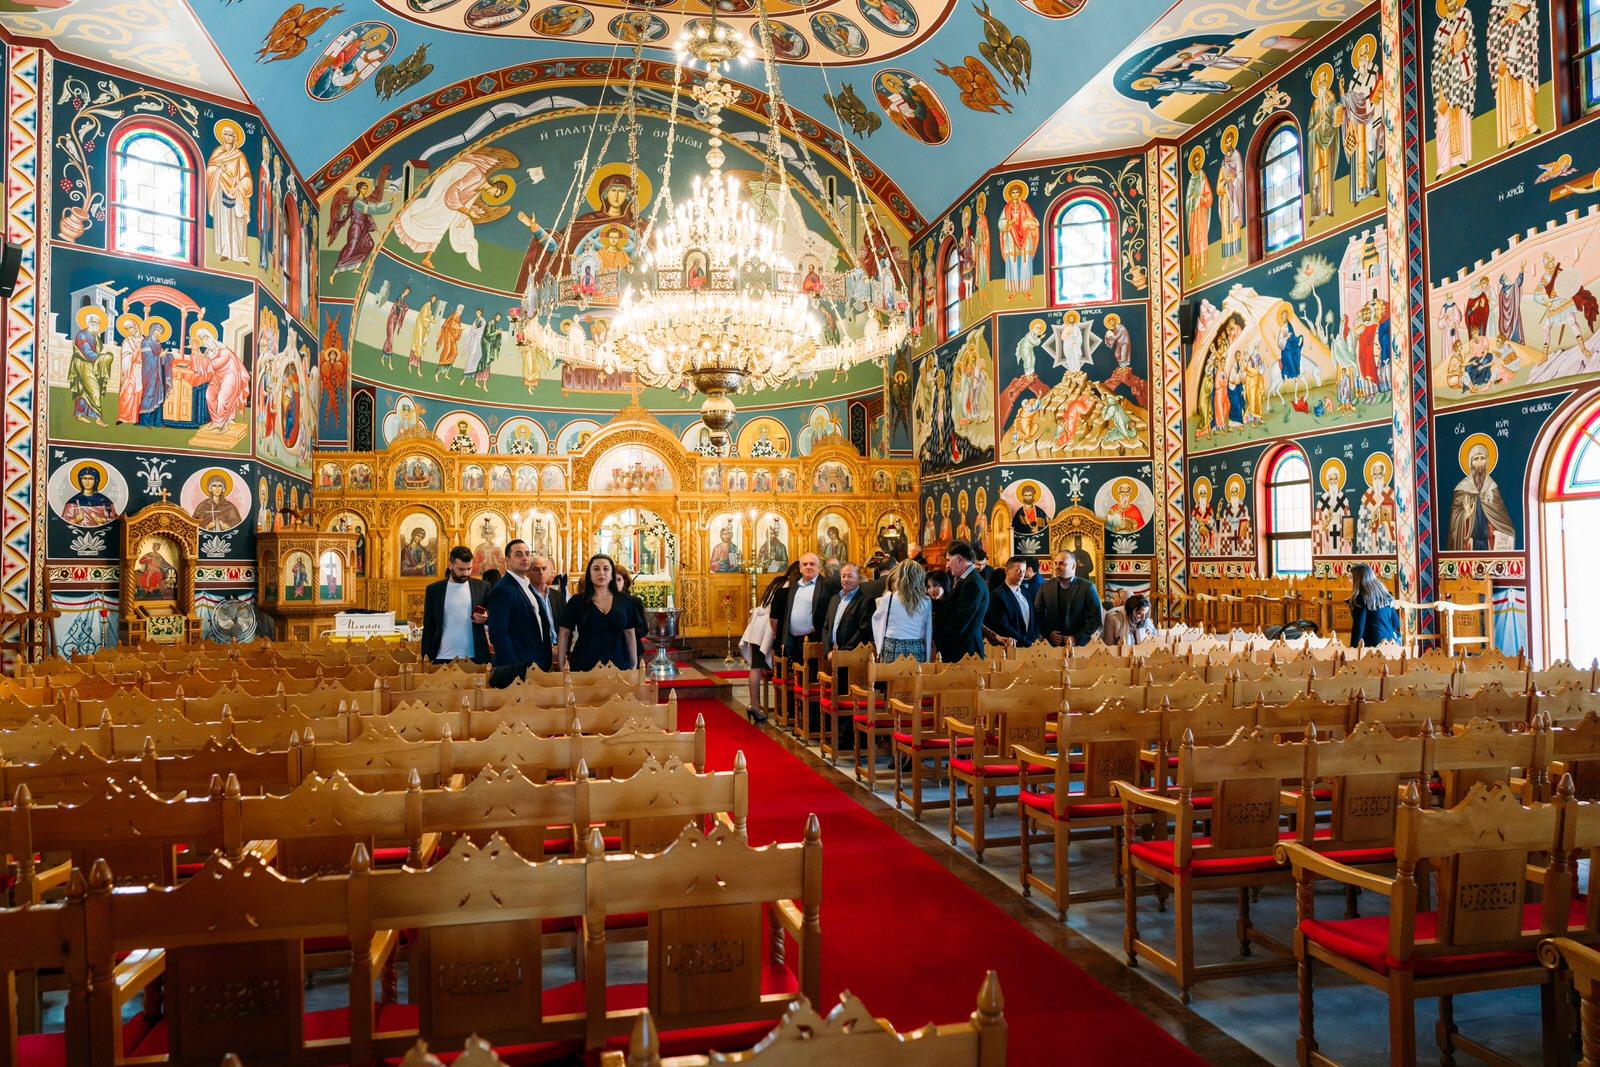 yianni-baptism-st-catherine-orthodox-mascot-laqua-40